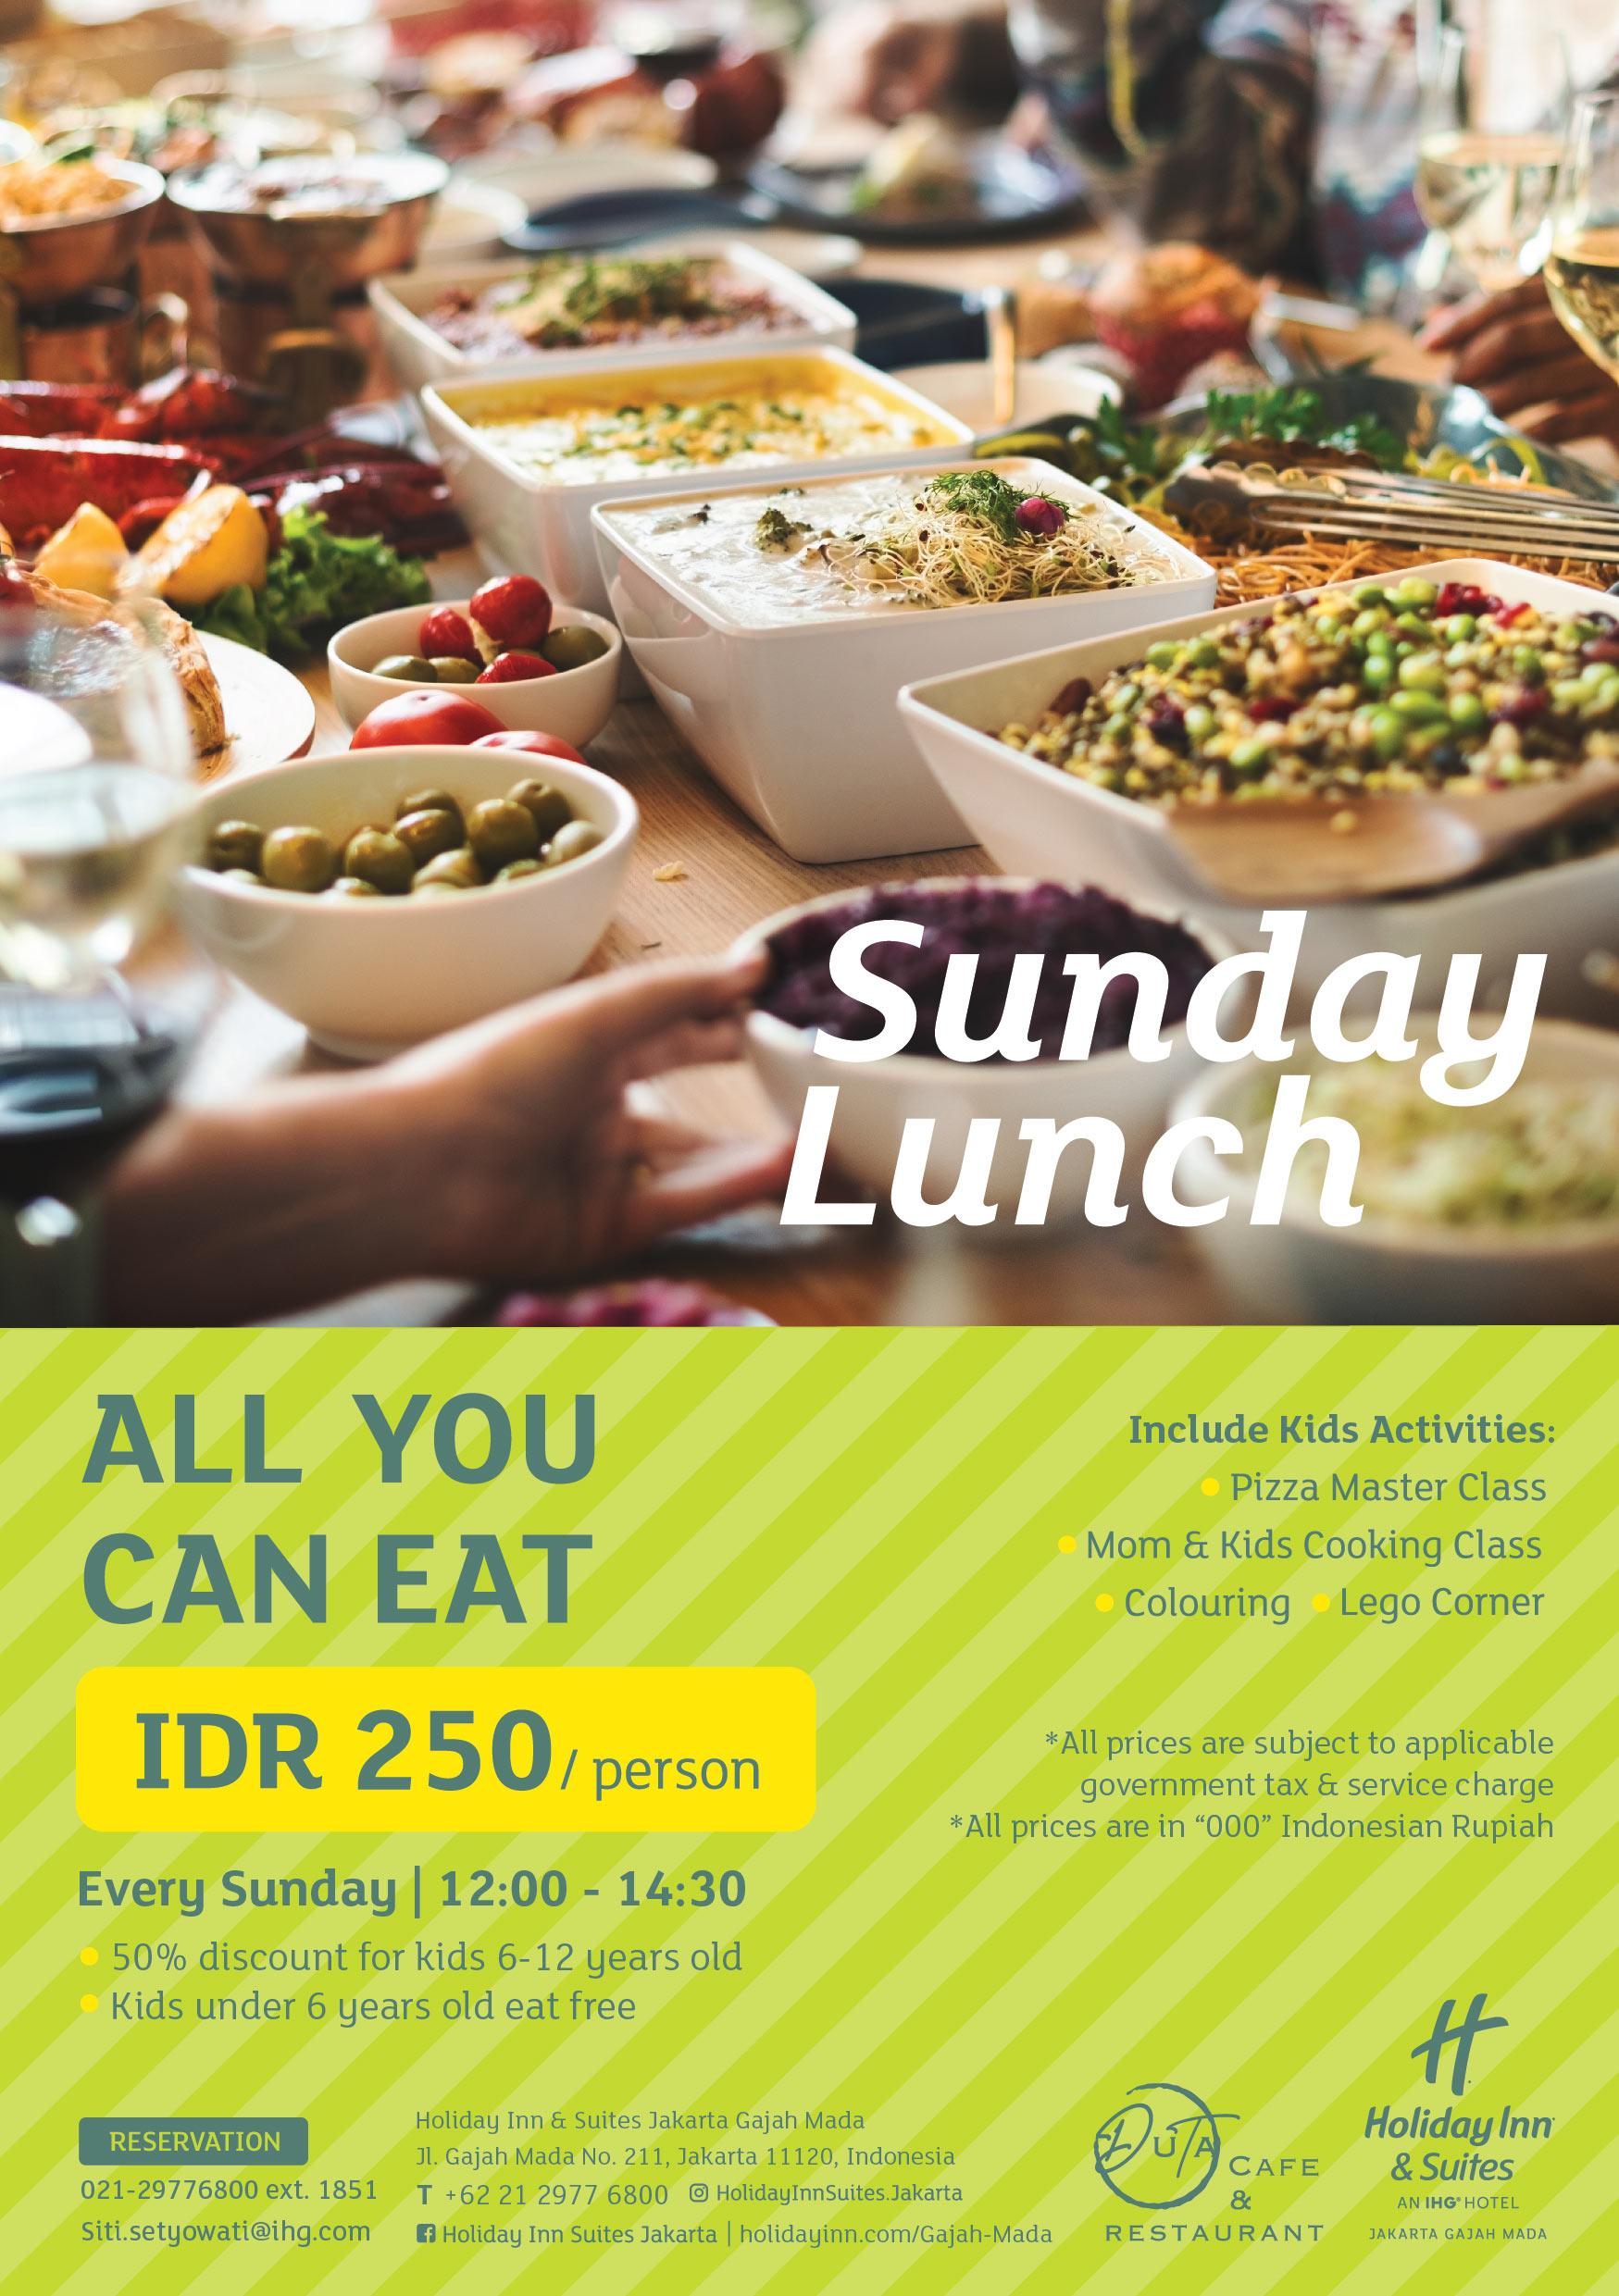 DUTA CAFÉ AT HOLIDAY INN & SUITES JAKARTA GAJAH MADA | CHOPE